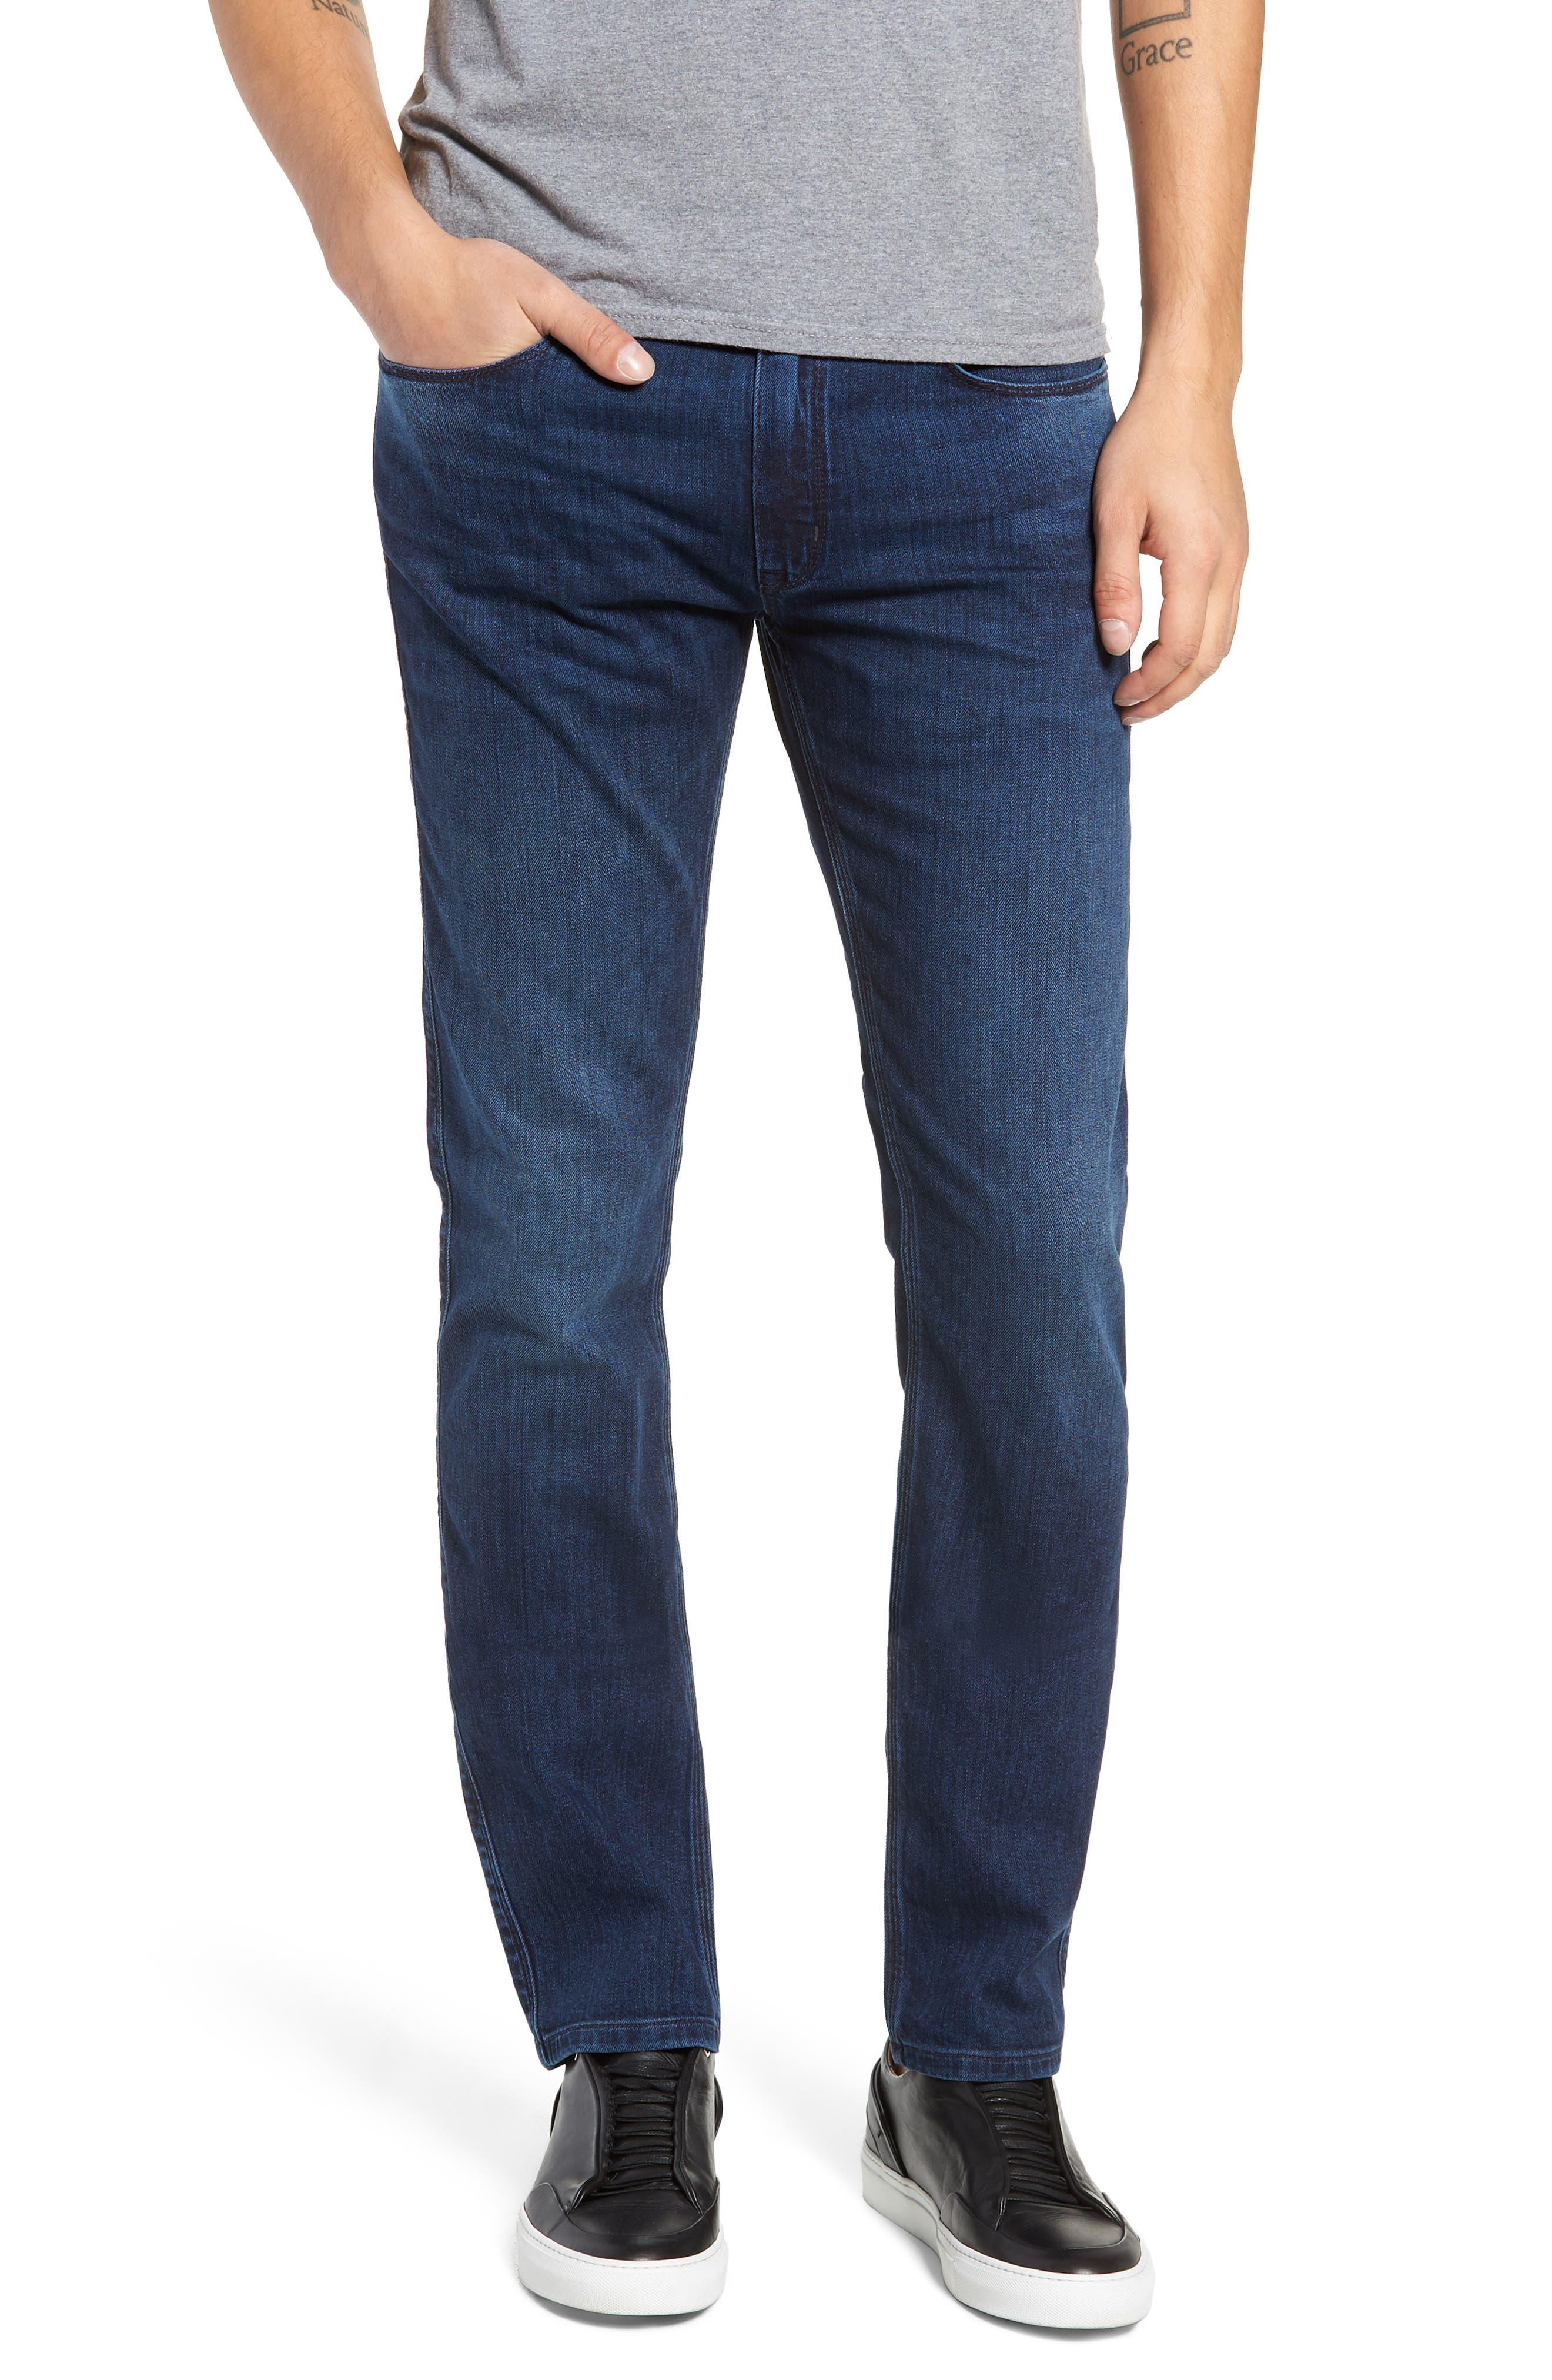 708 Stretch Slim Fit Jeans,                         Main,                         color, 420